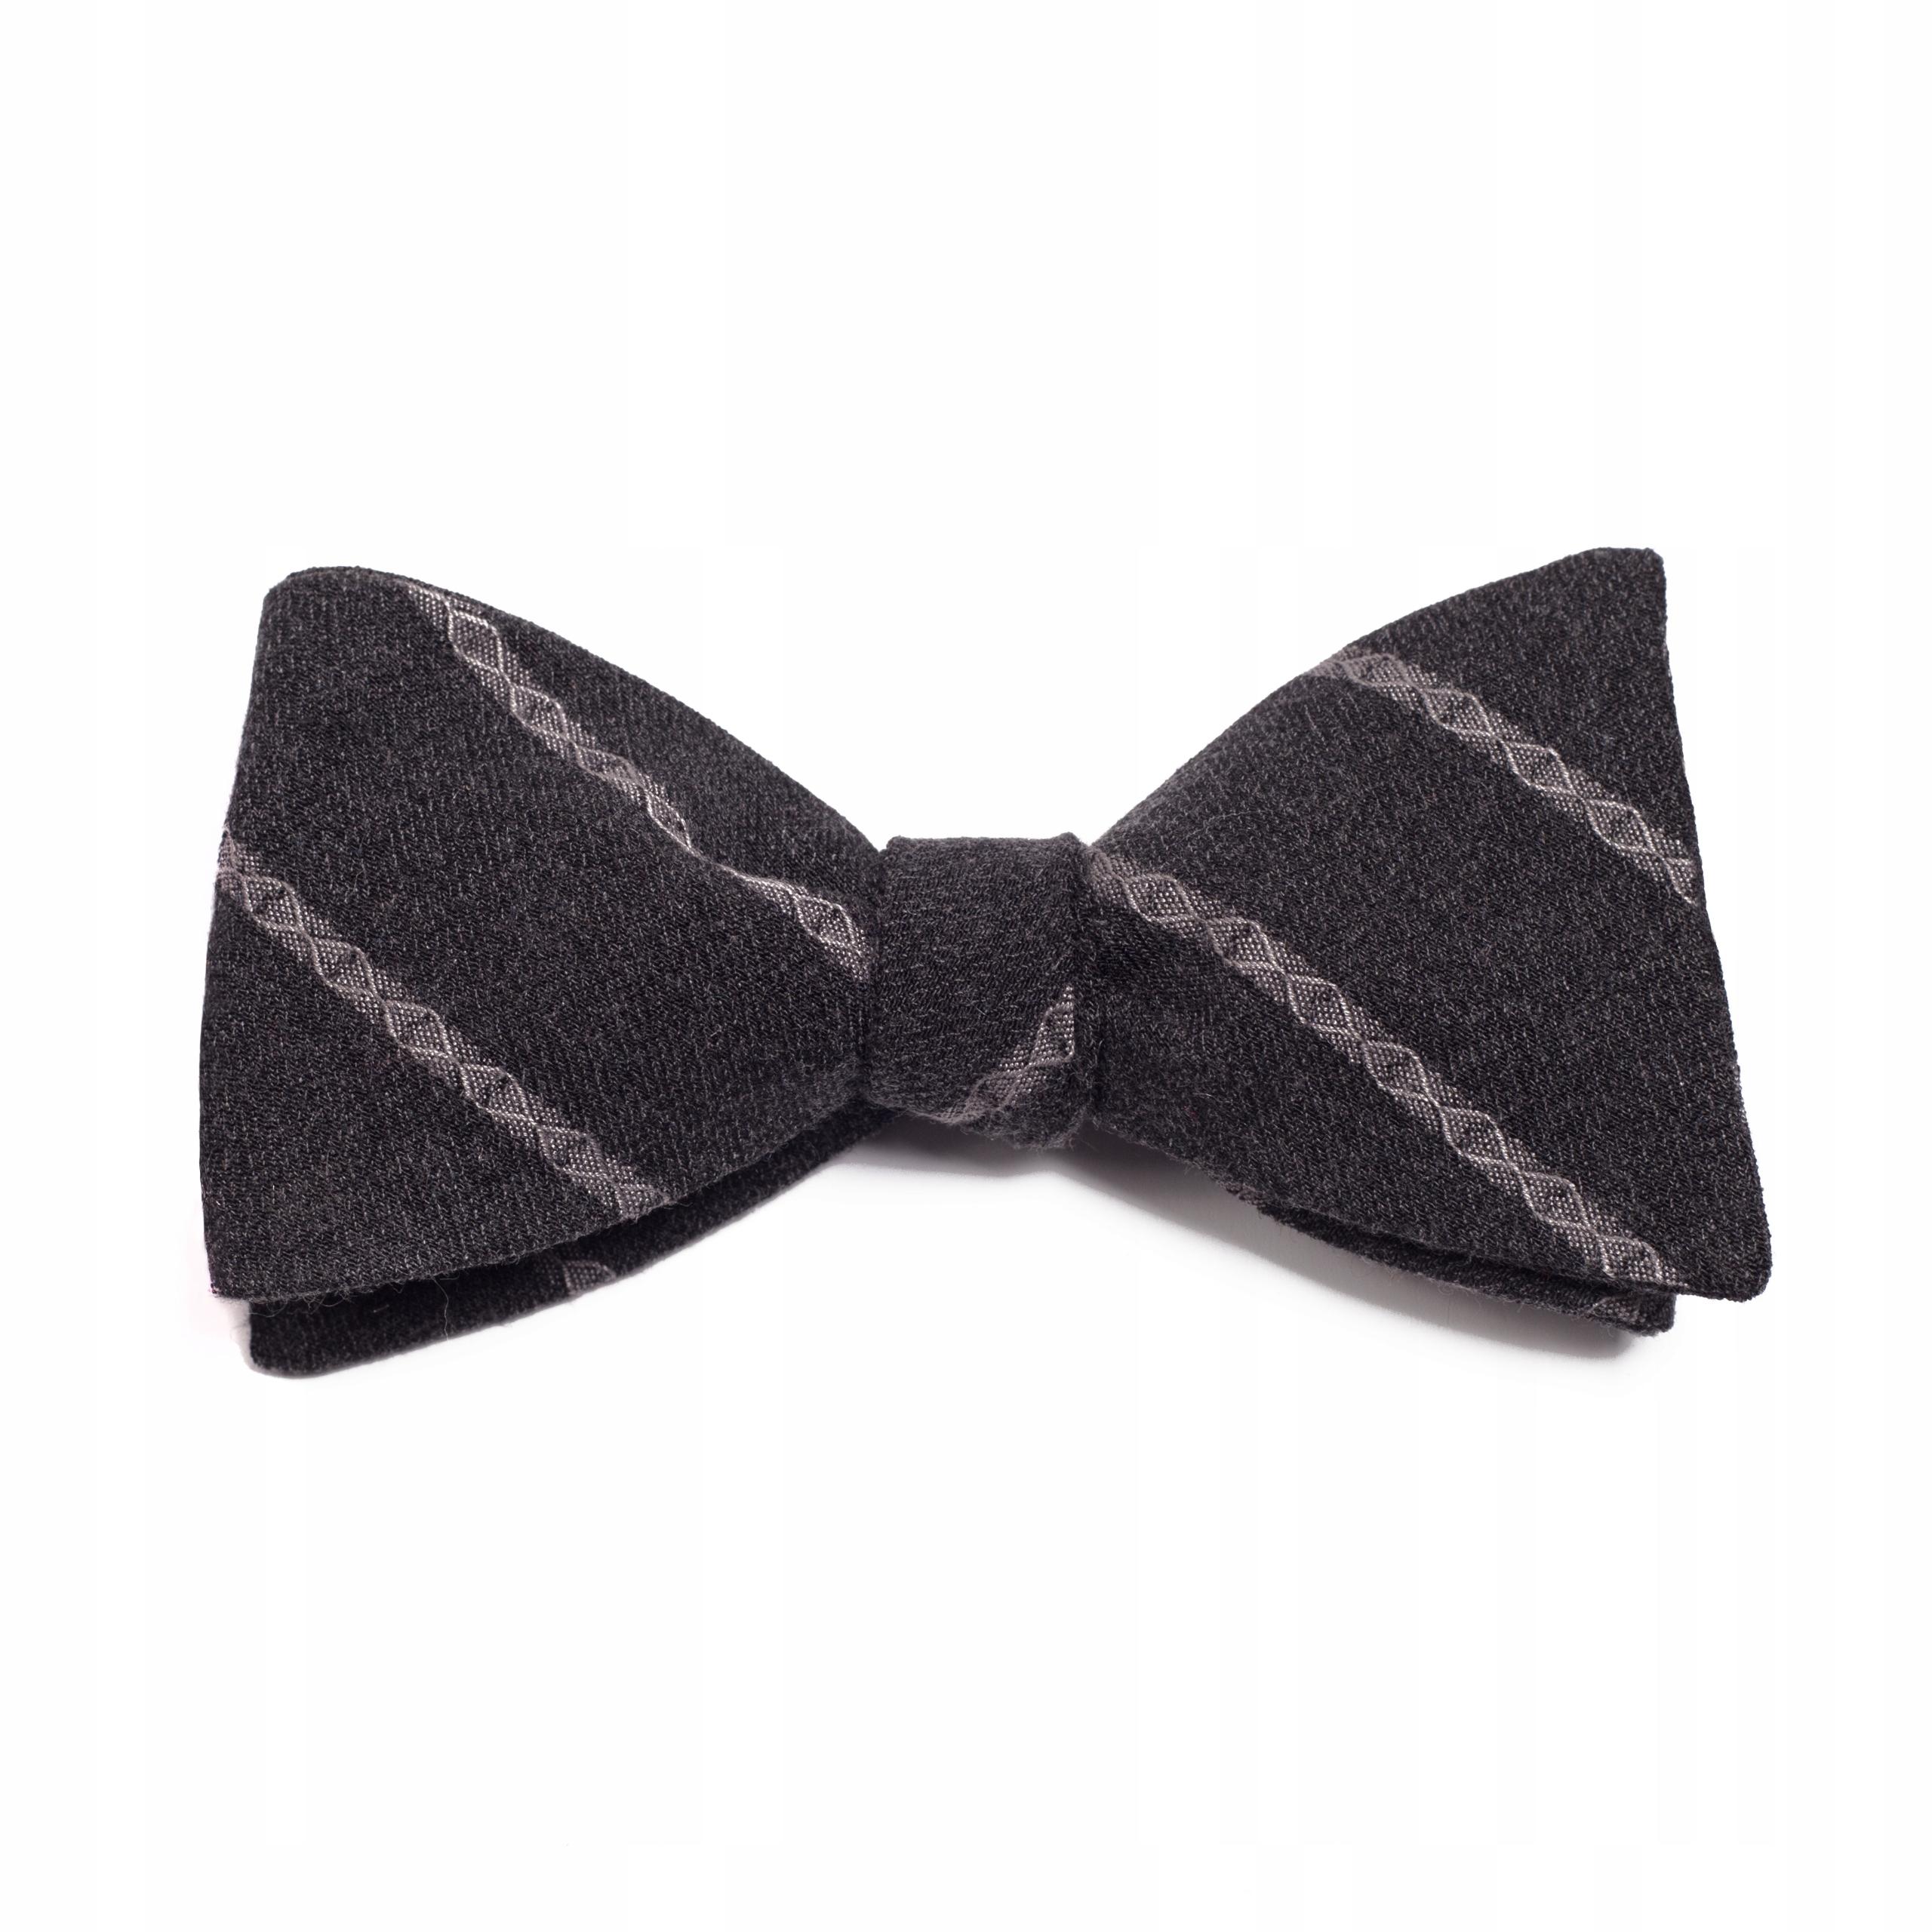 Retro kravatu mužov pruhované - Dilaretti.com